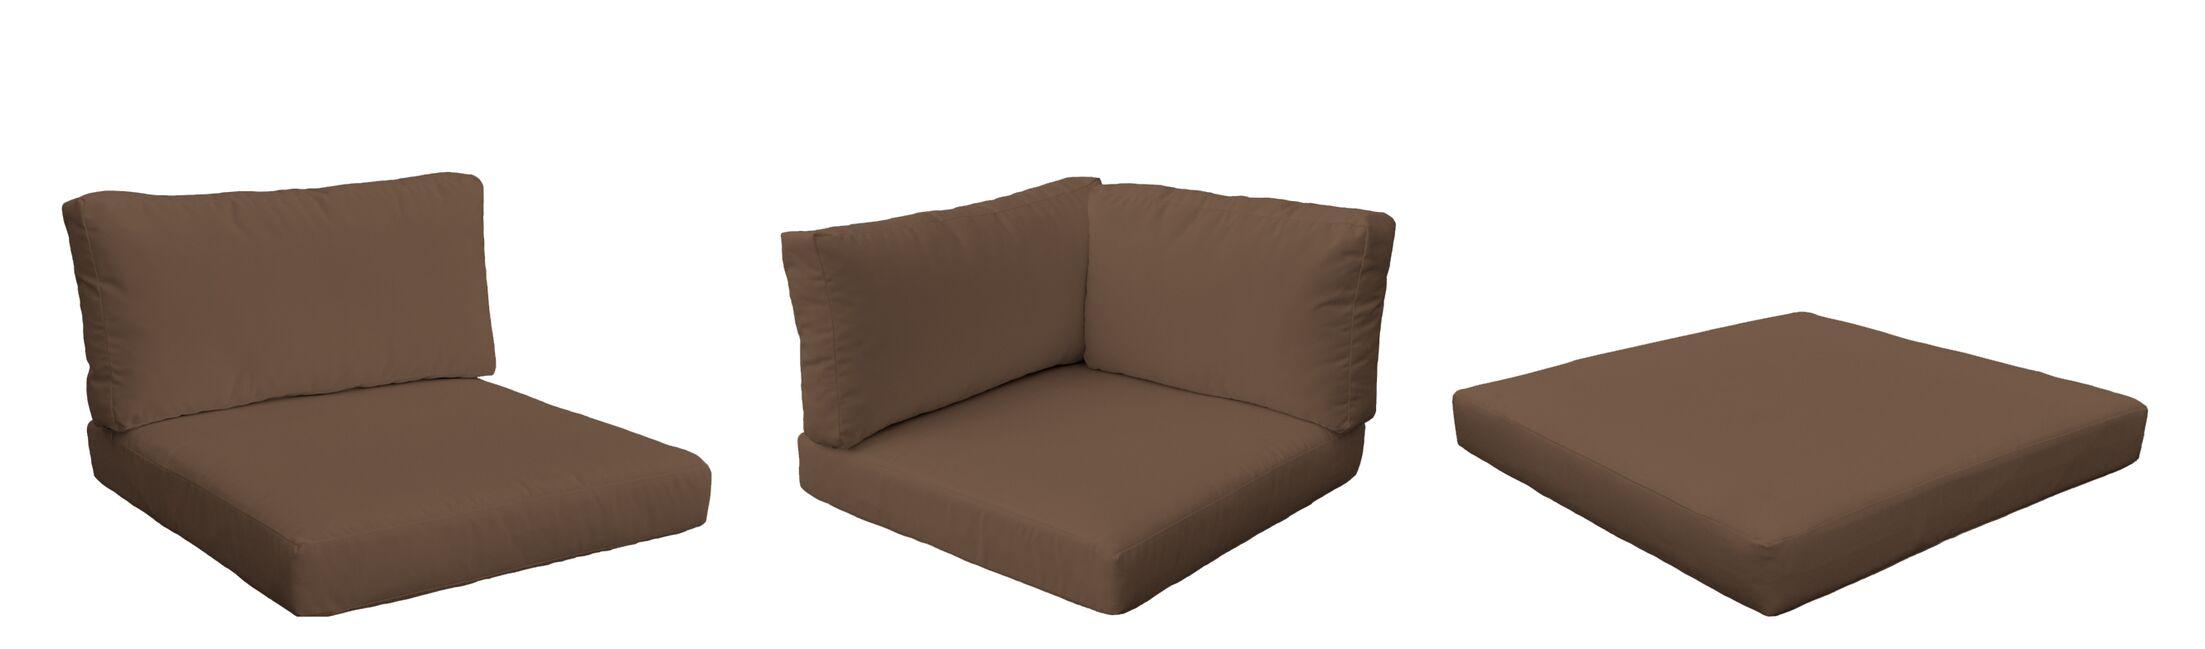 Monaco 23 Piece Outdoor Cushion Set Fabric: Cocoa